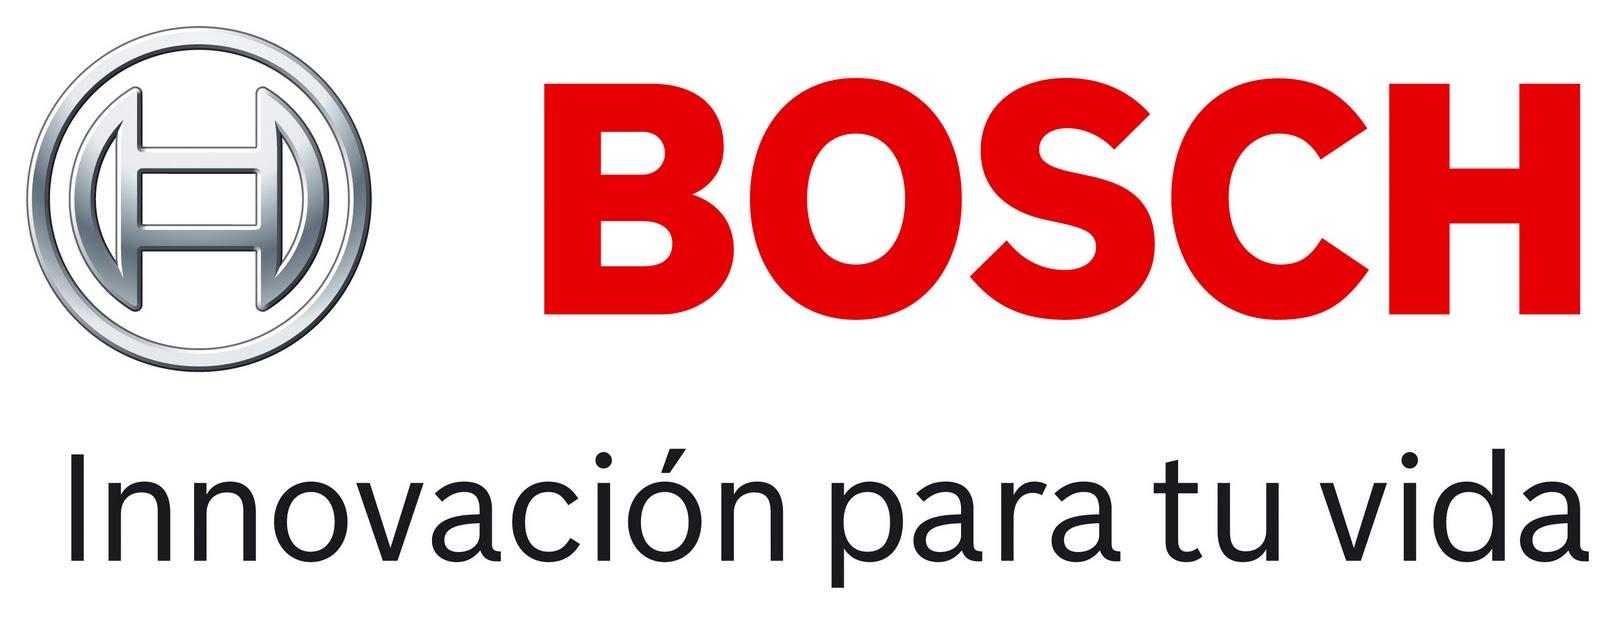 Bosch siemens electrodomesticos espana